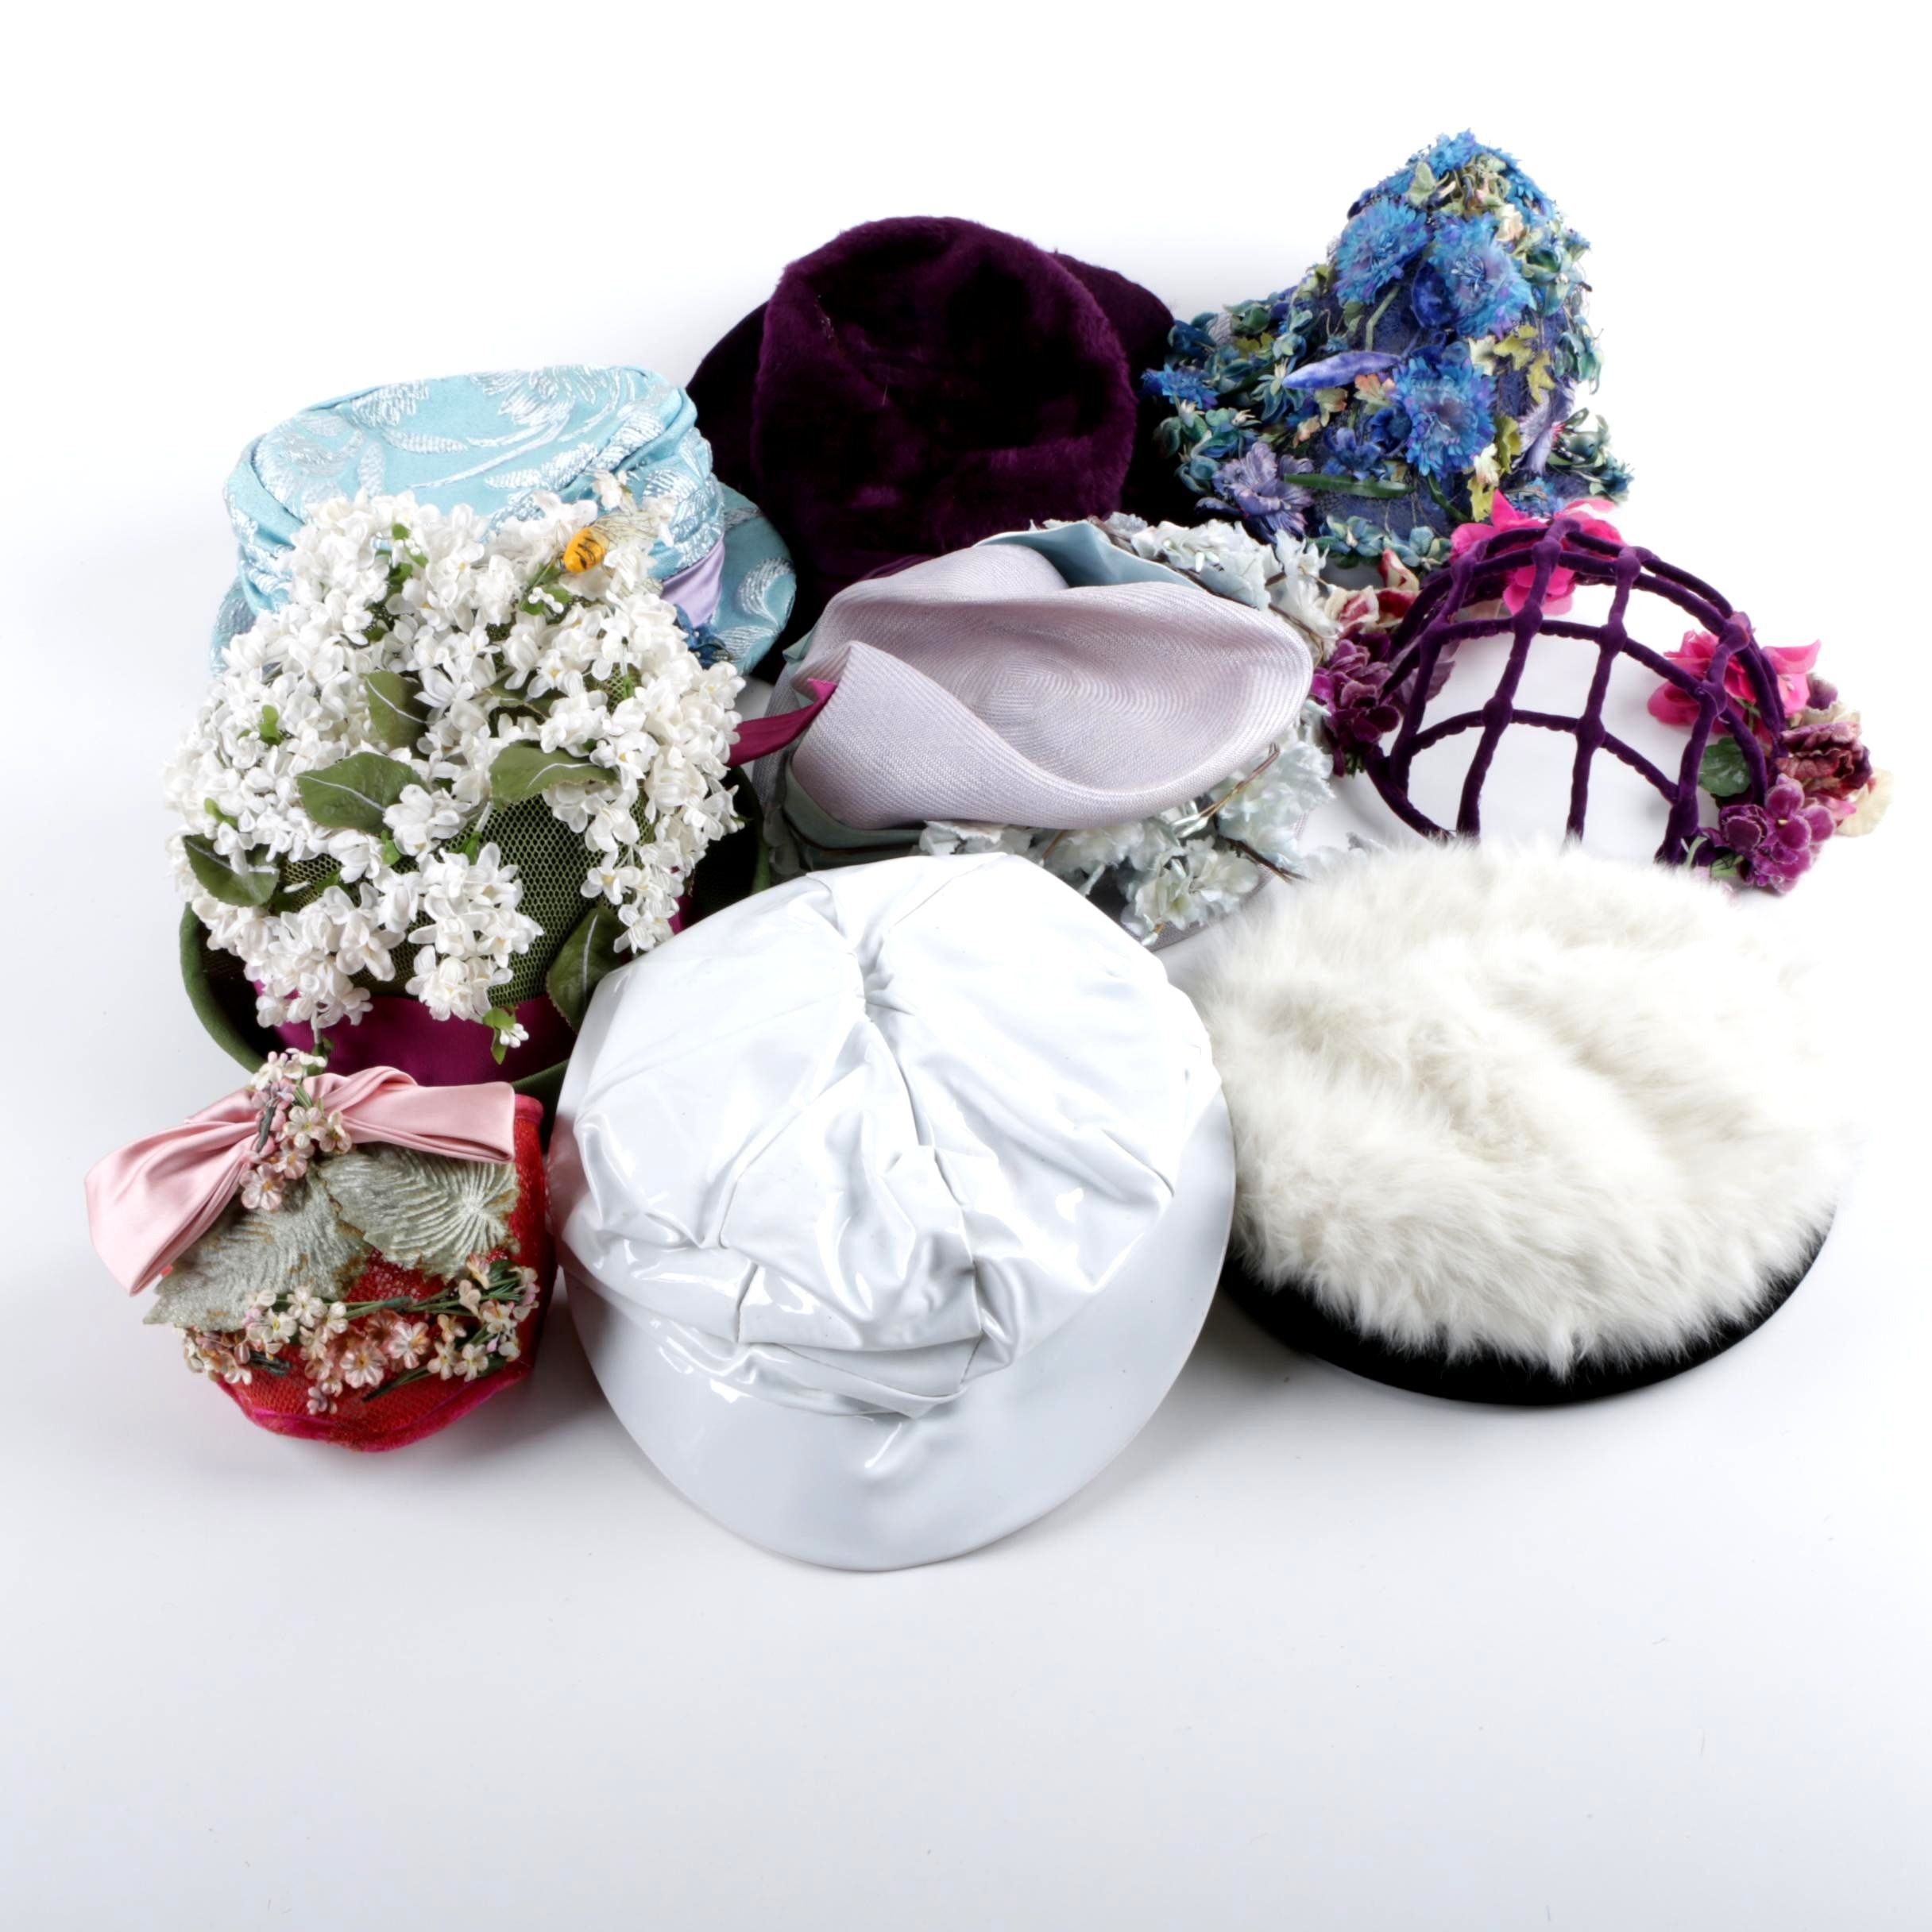 Vintage Hats and Headwear Including Gwenn Pennington